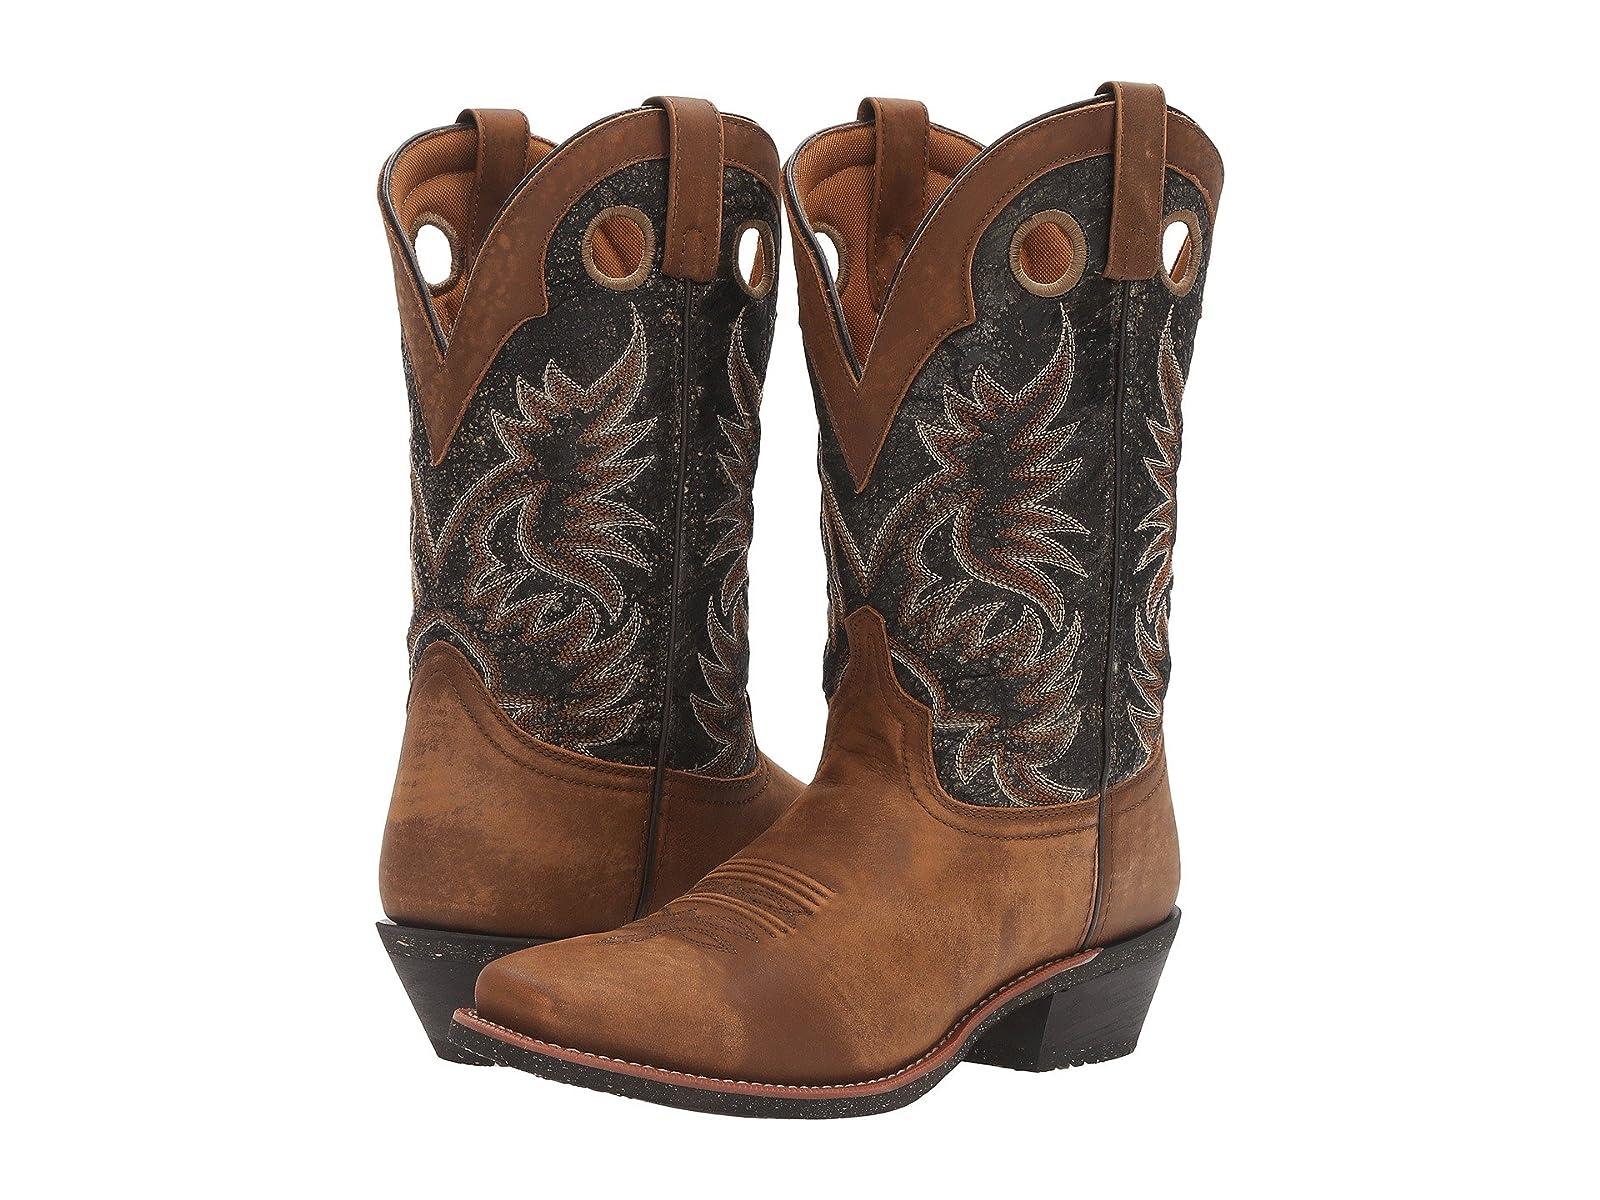 Laredo StillwaterAffordable and distinctive shoes